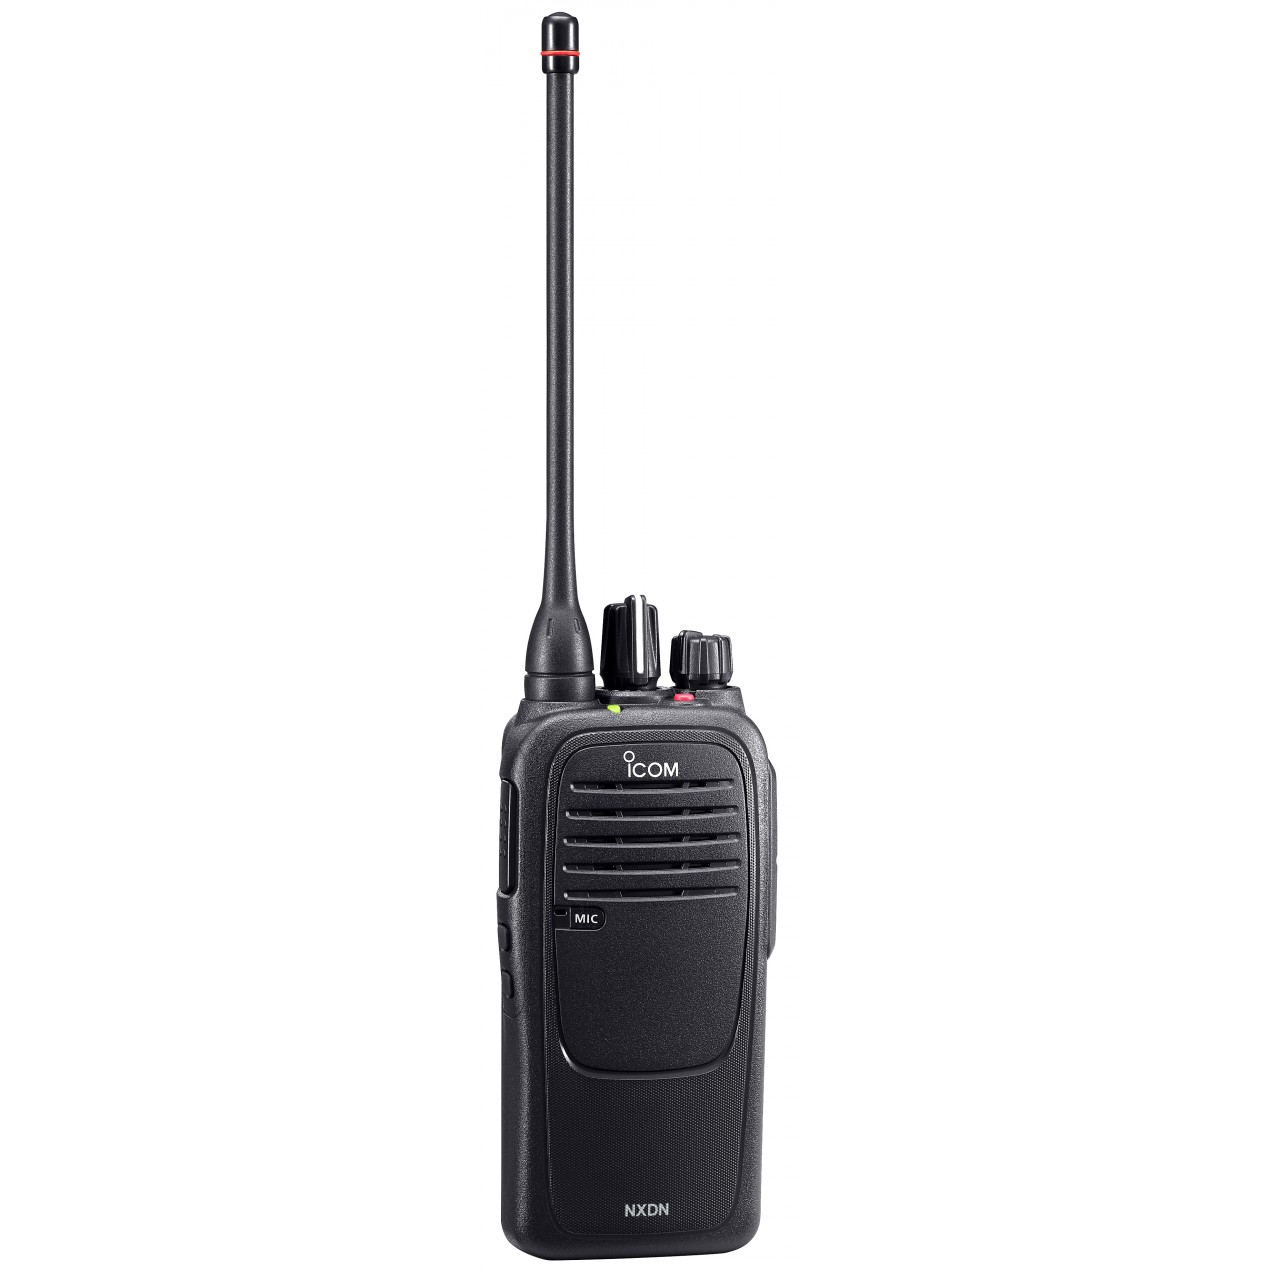 IC-F2000D Handhelds - ICOM